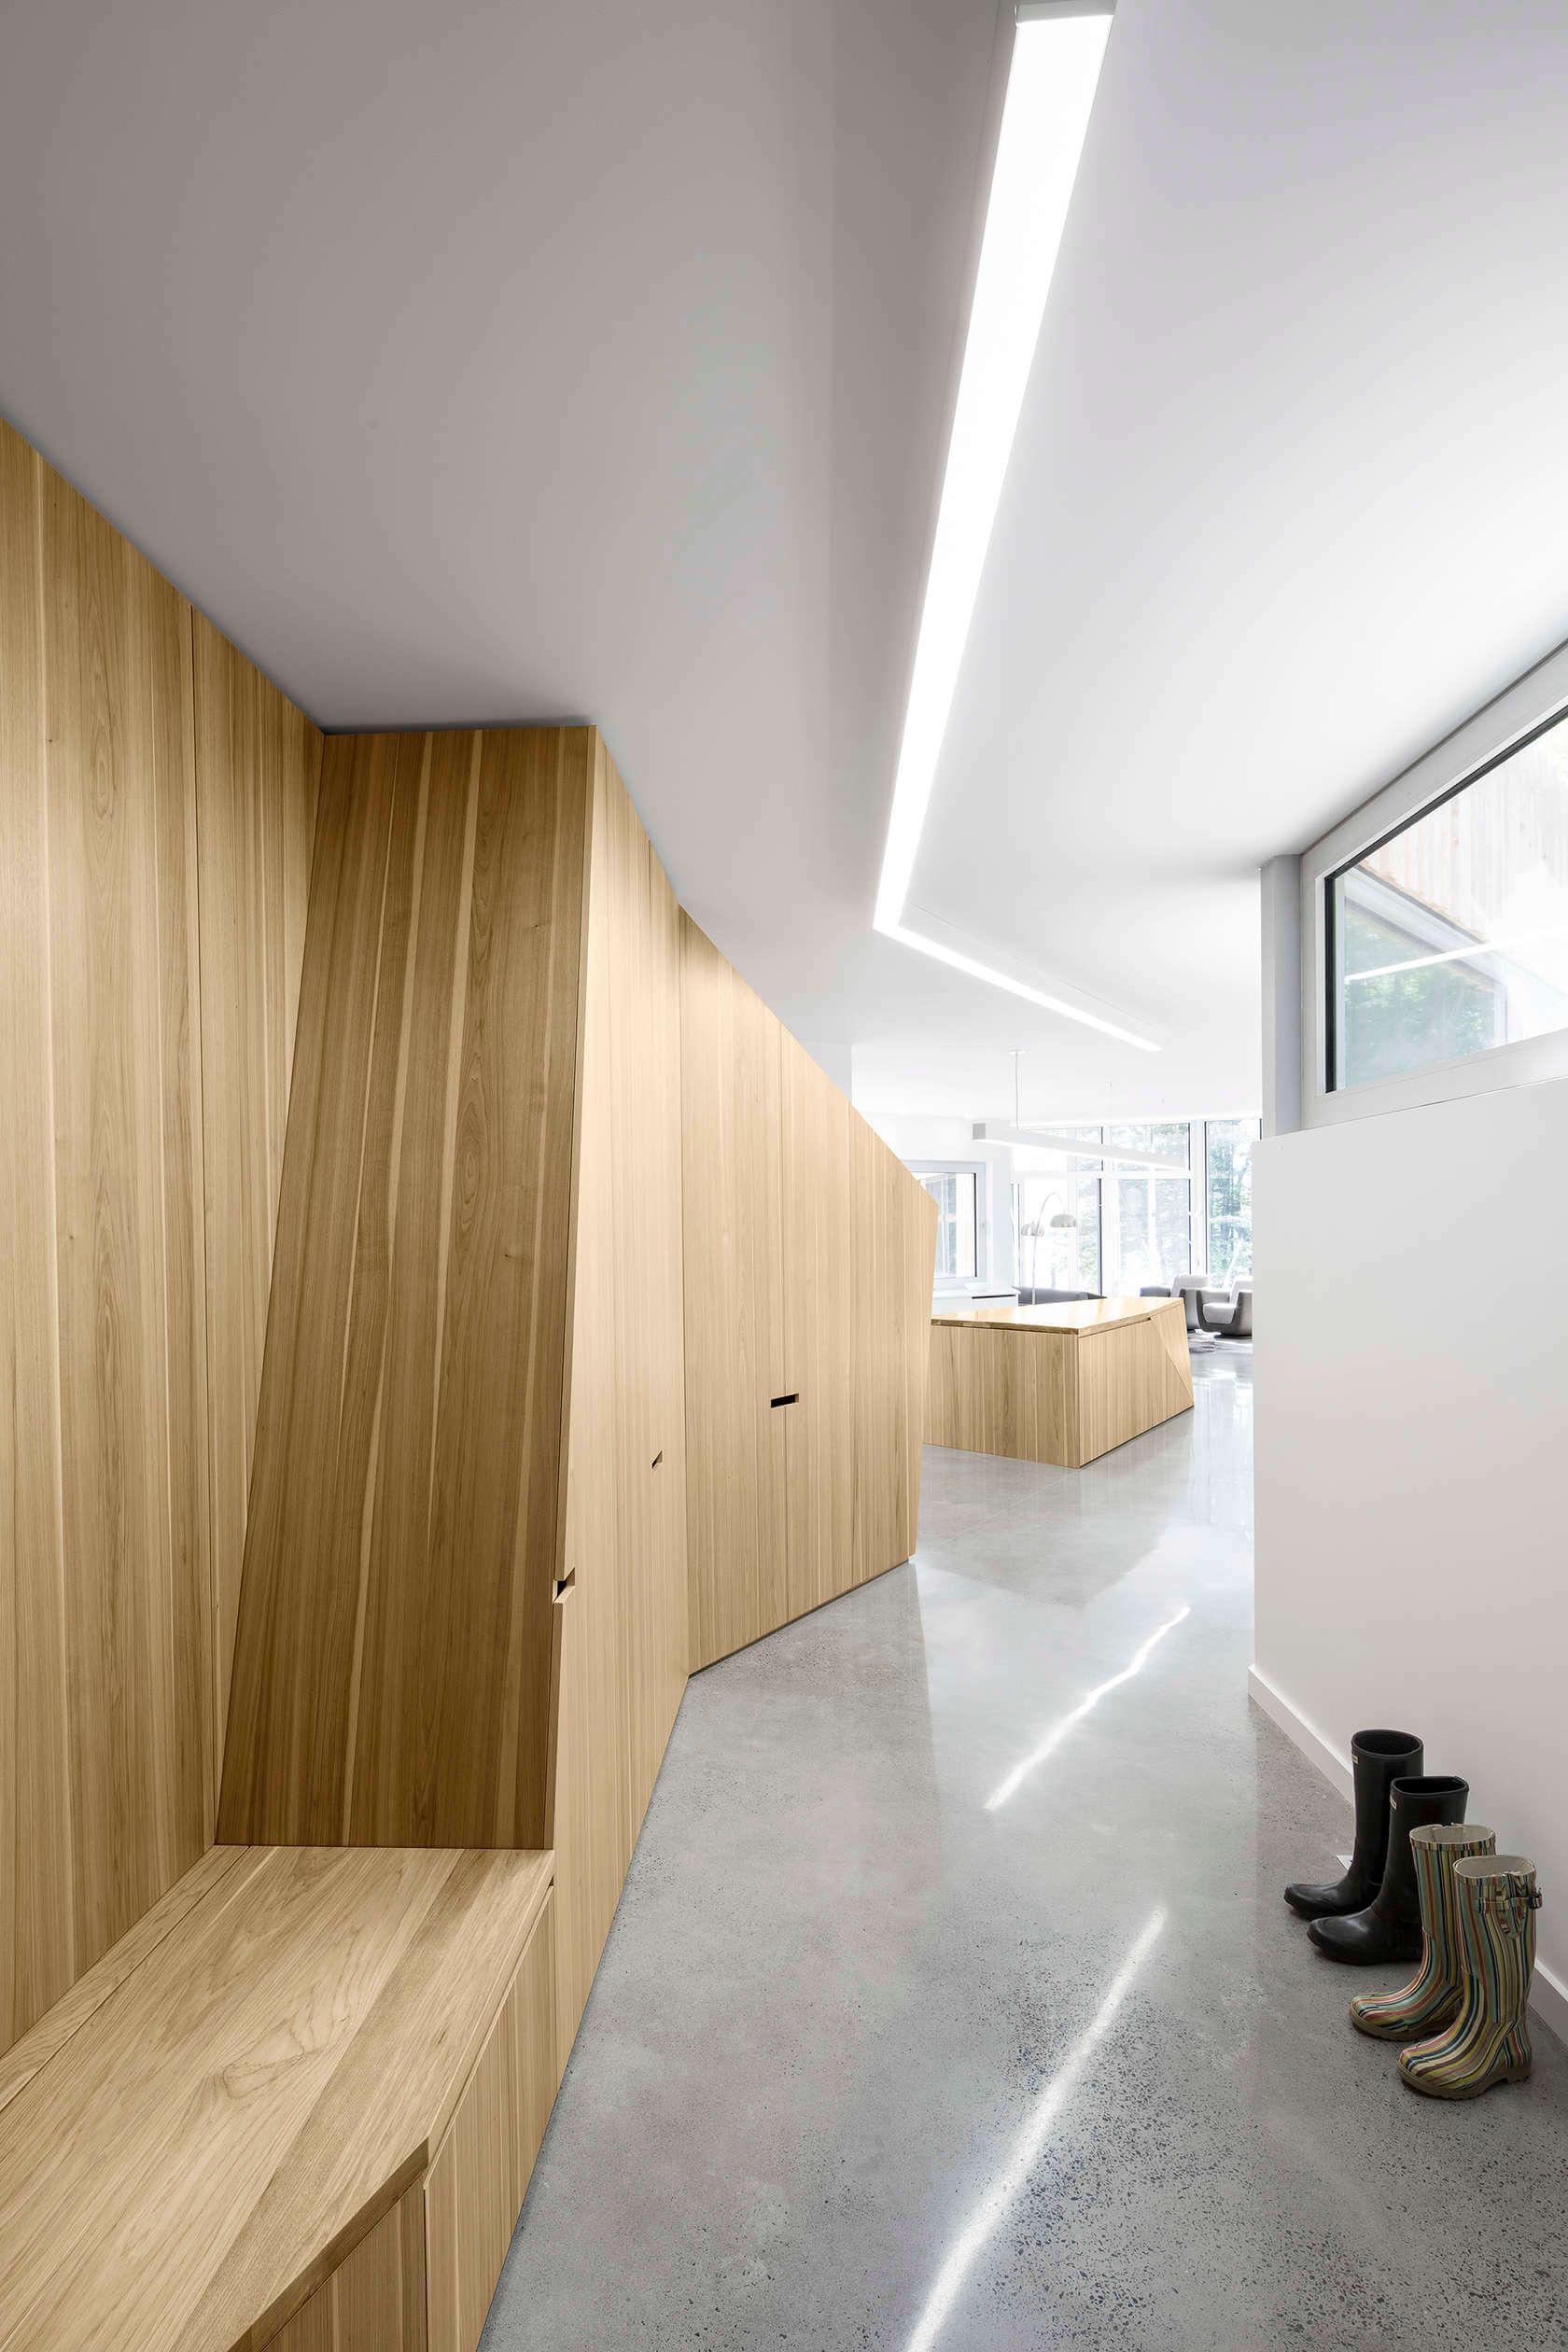 architecture_house_apartment_design_studia_interiors_osnovadesign_osnova_poltava_03